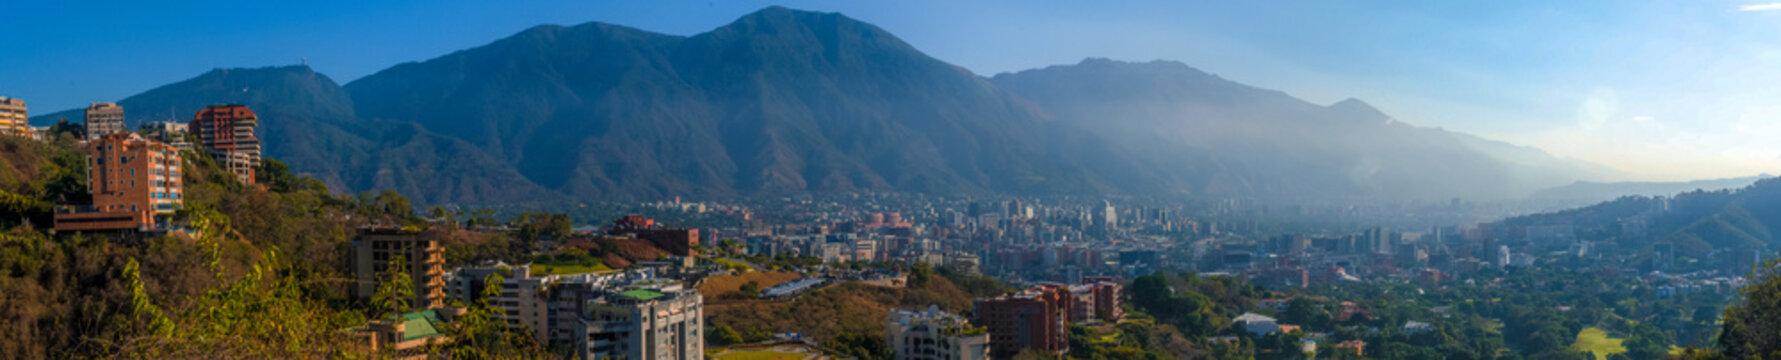 Panoramica de Caracas